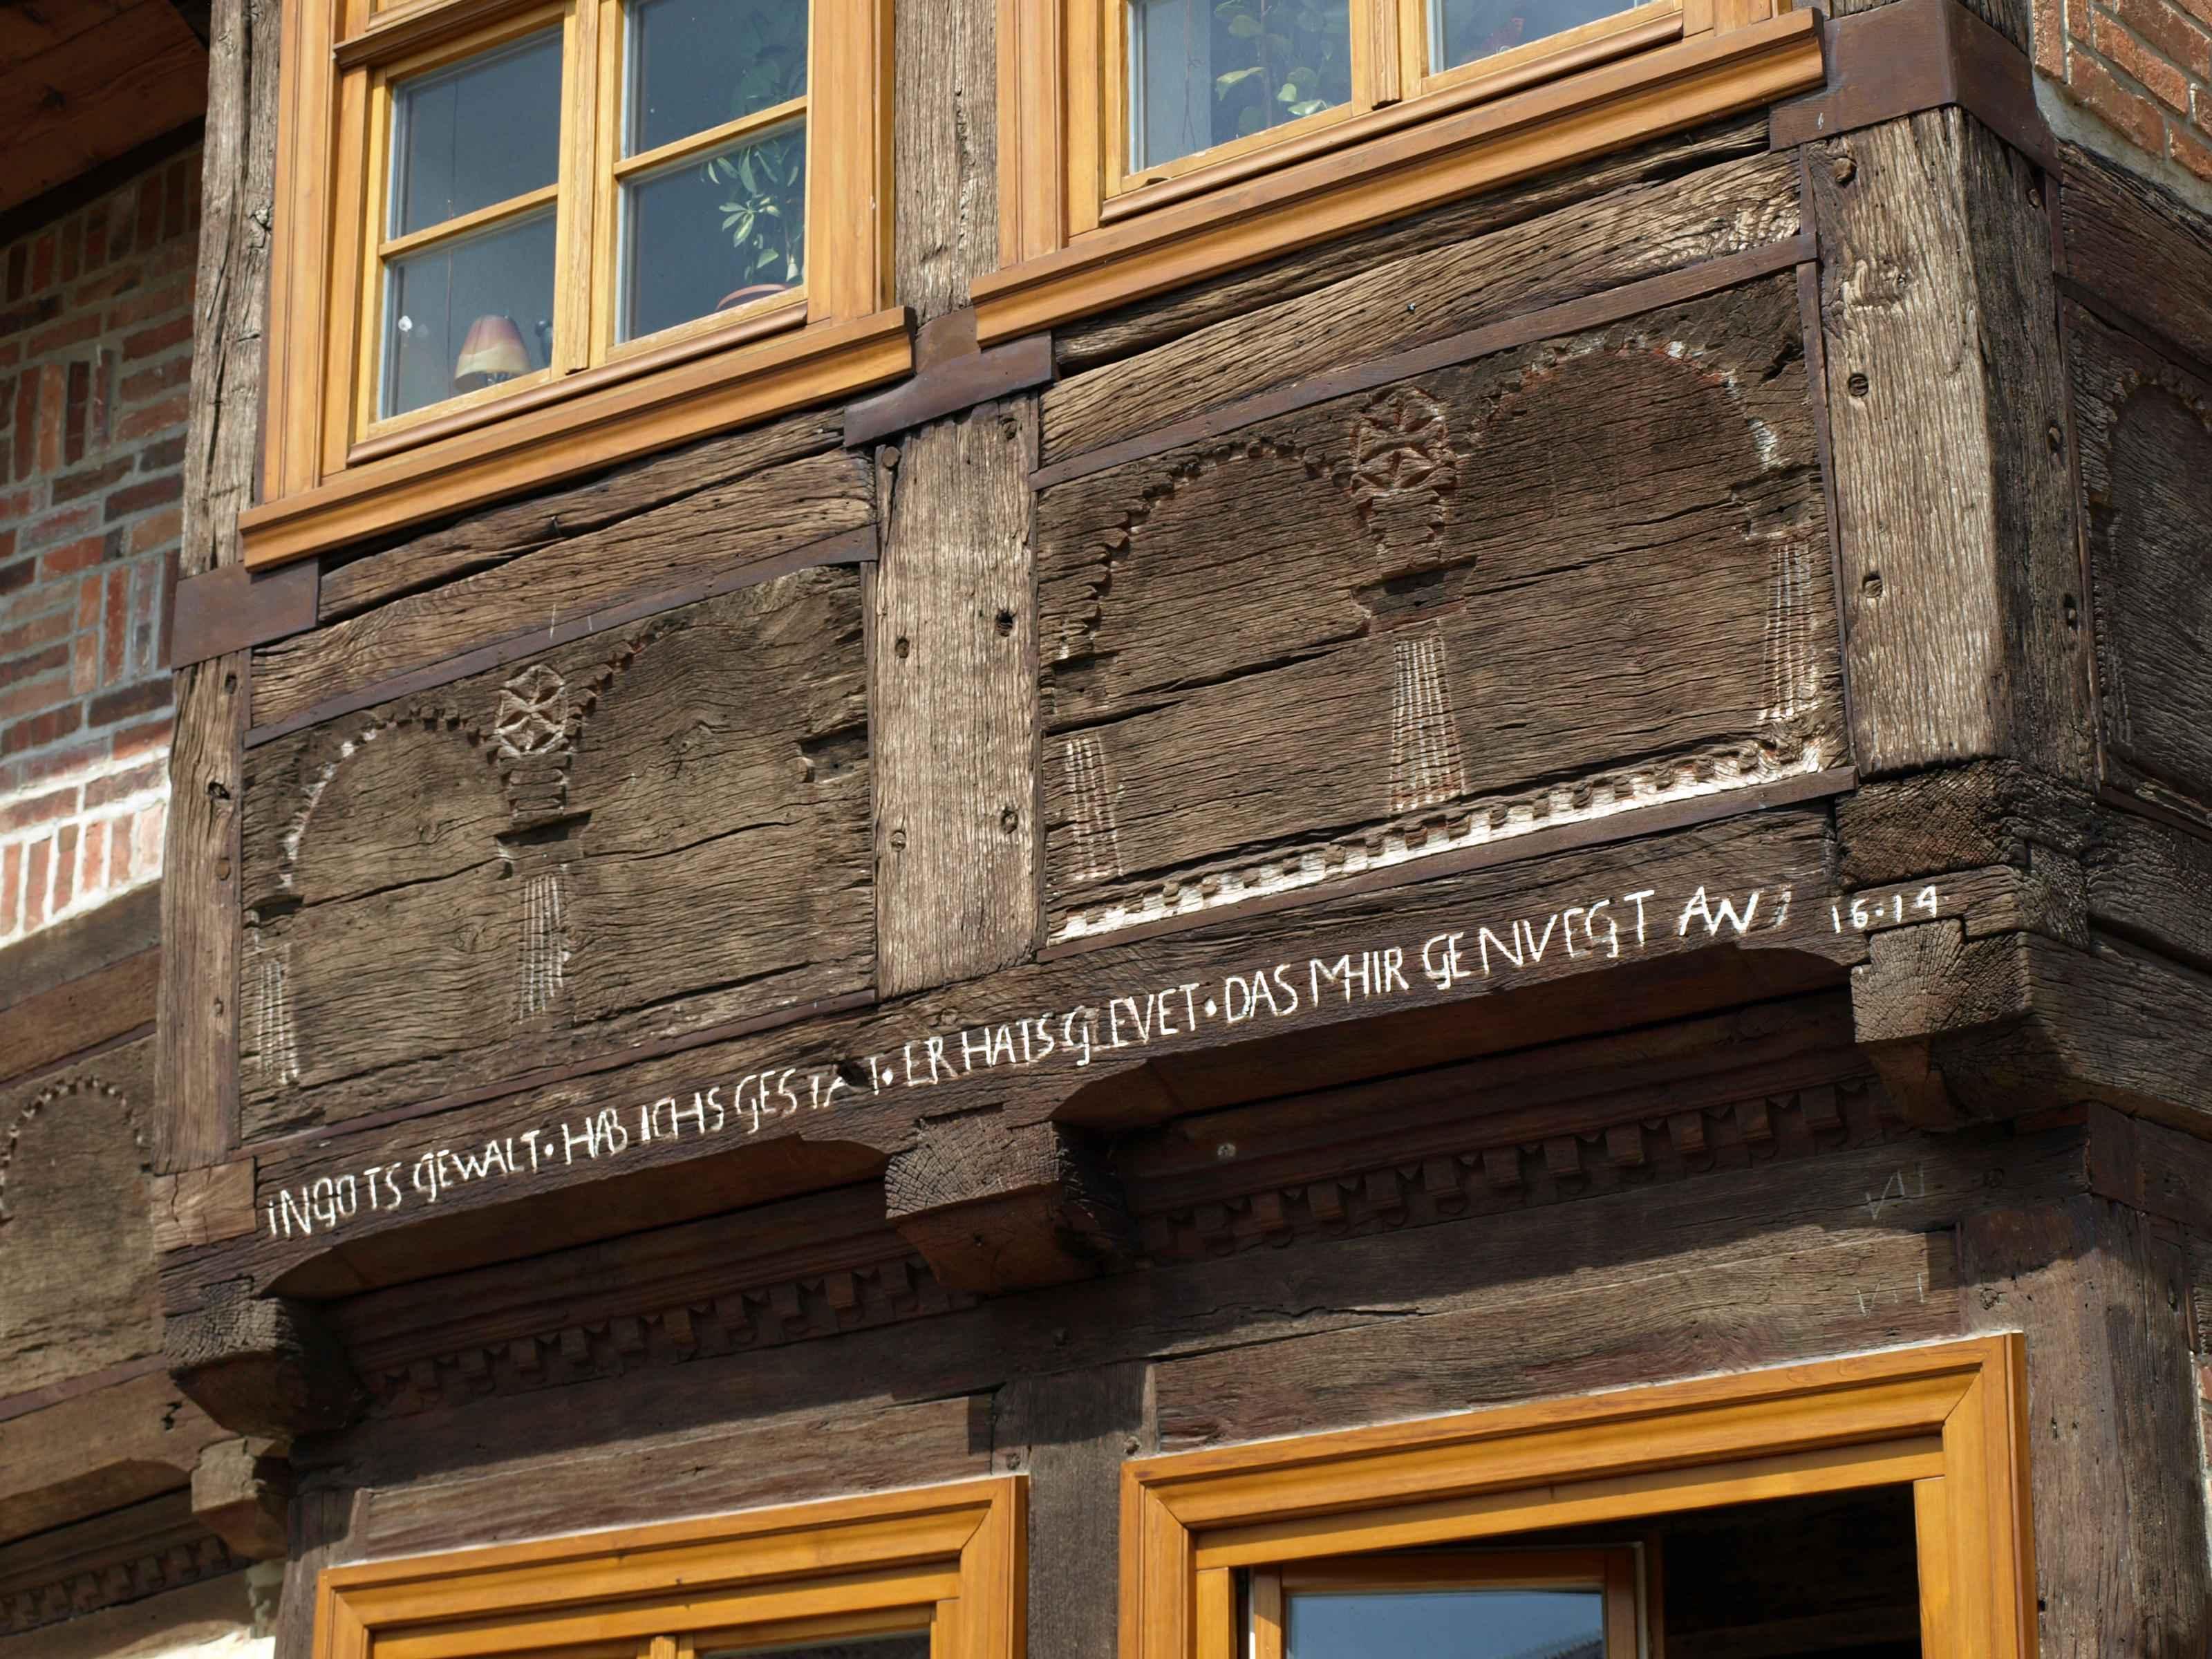 Holzvertäfelung file holzvertäfelung jpg wikimedia commons